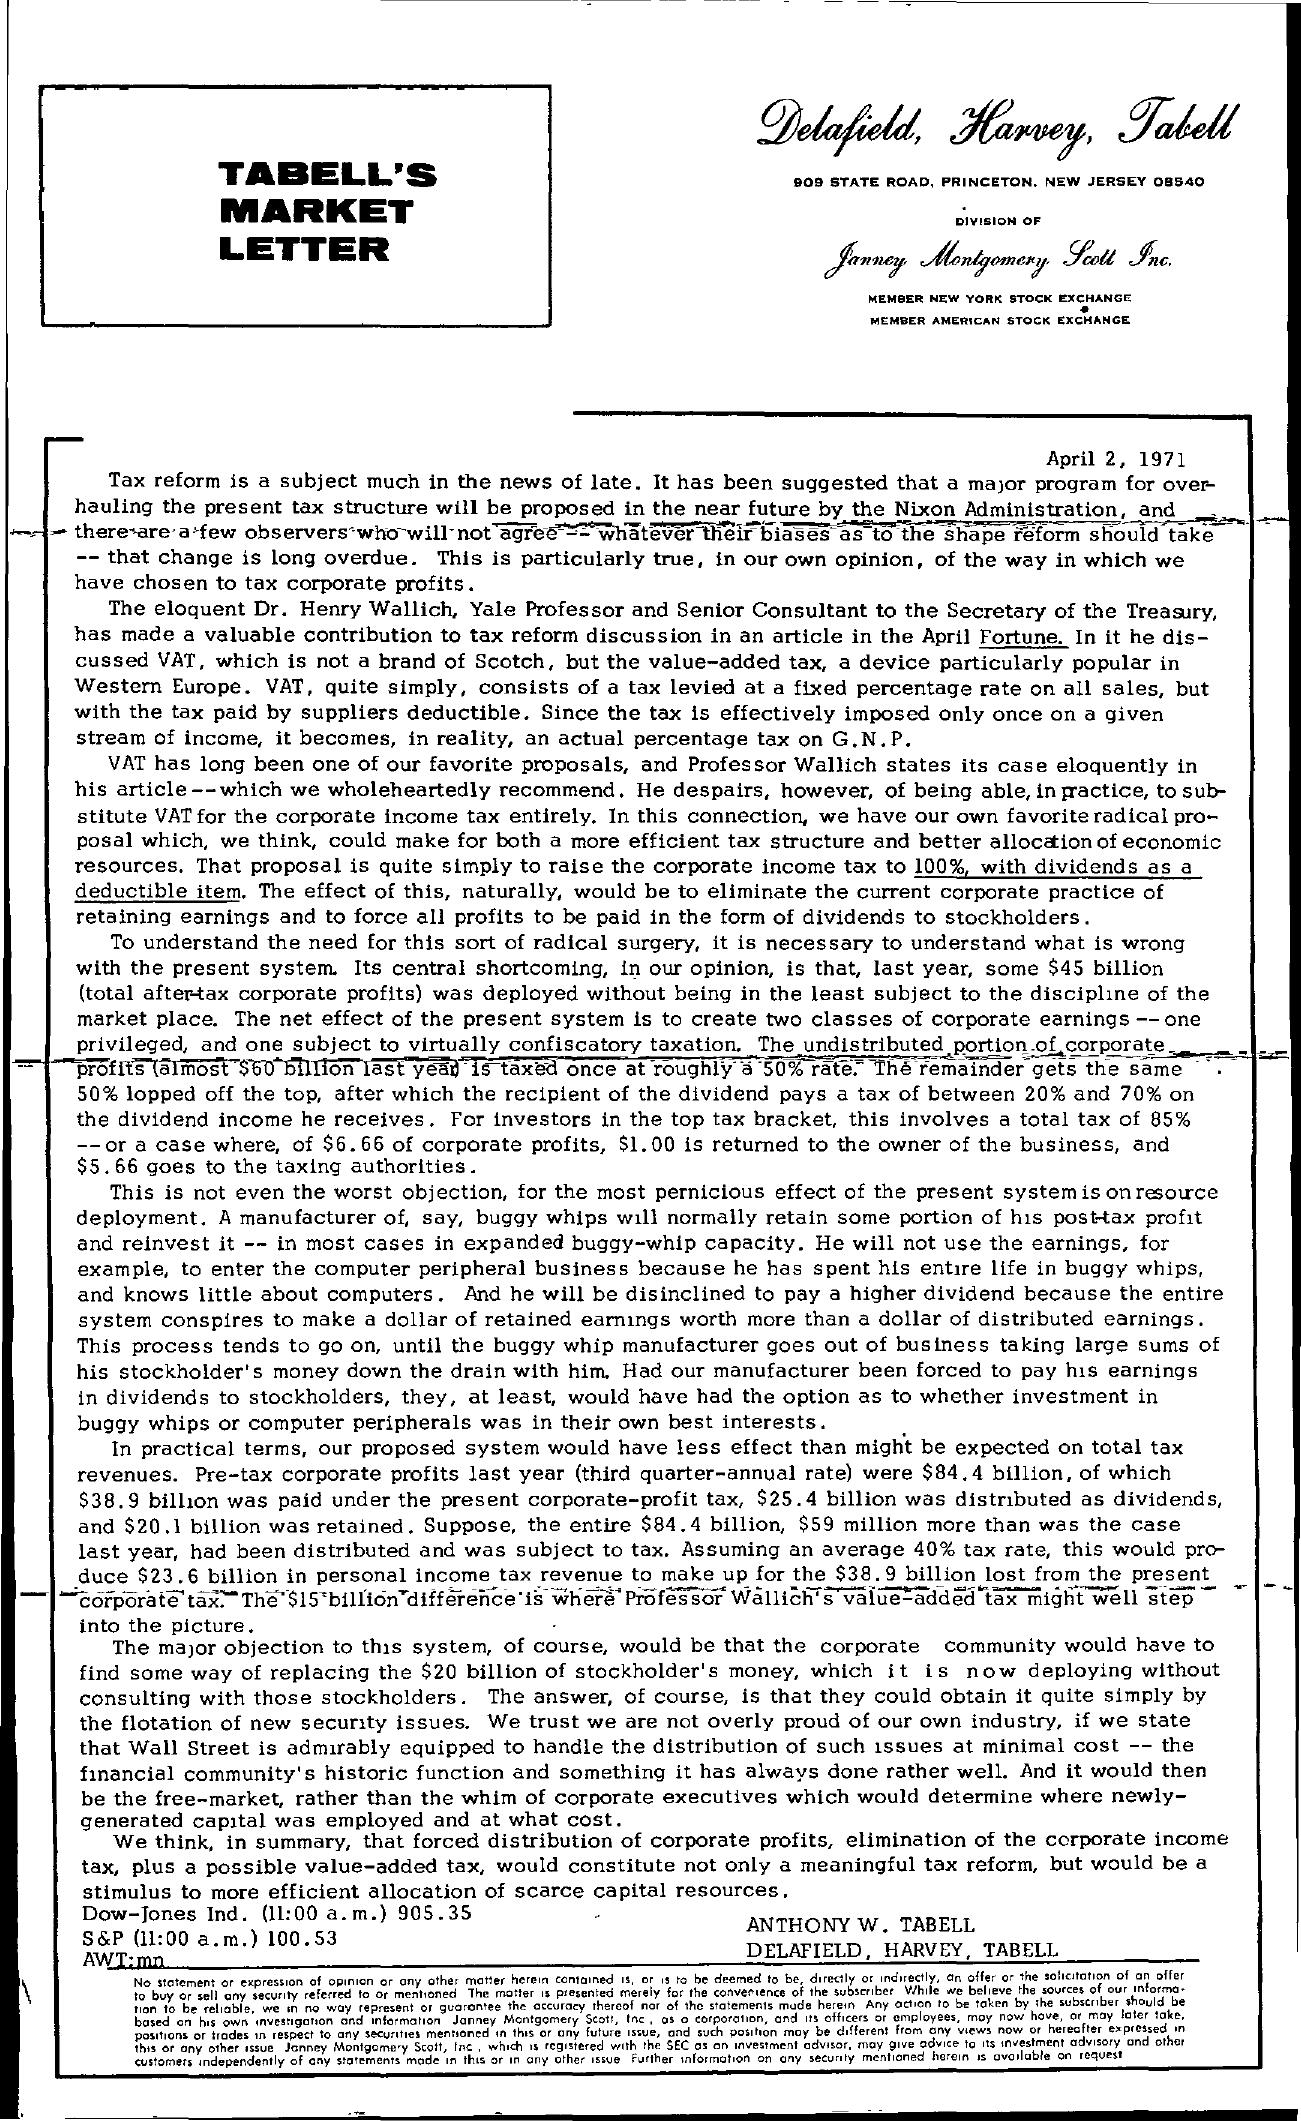 Tabell's Market Letter - April 02, 1971